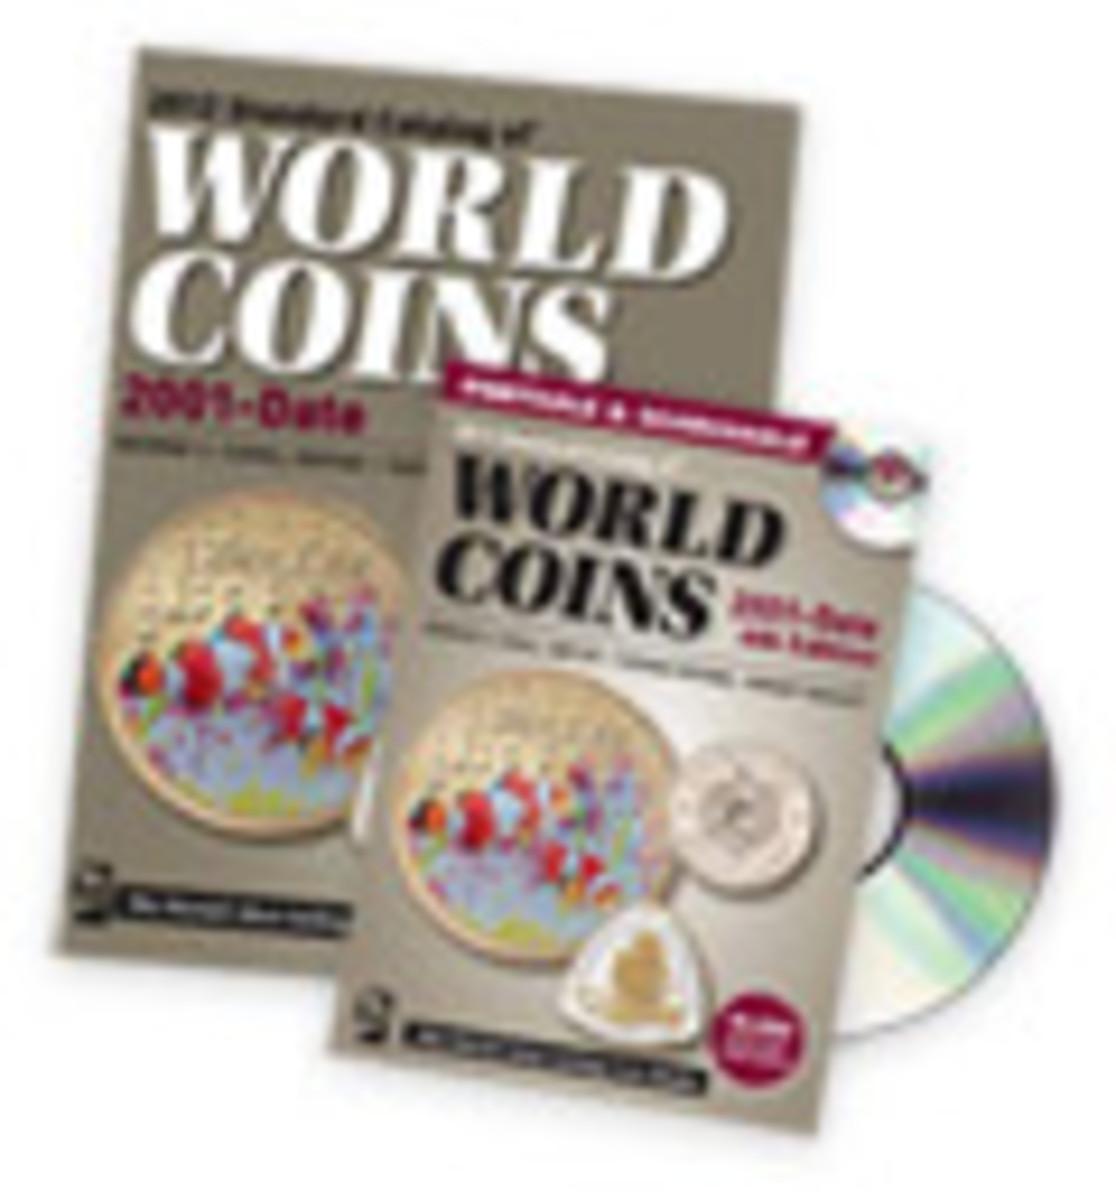 2012 Standard Catalog of World Coins 2001-Date Book + CD